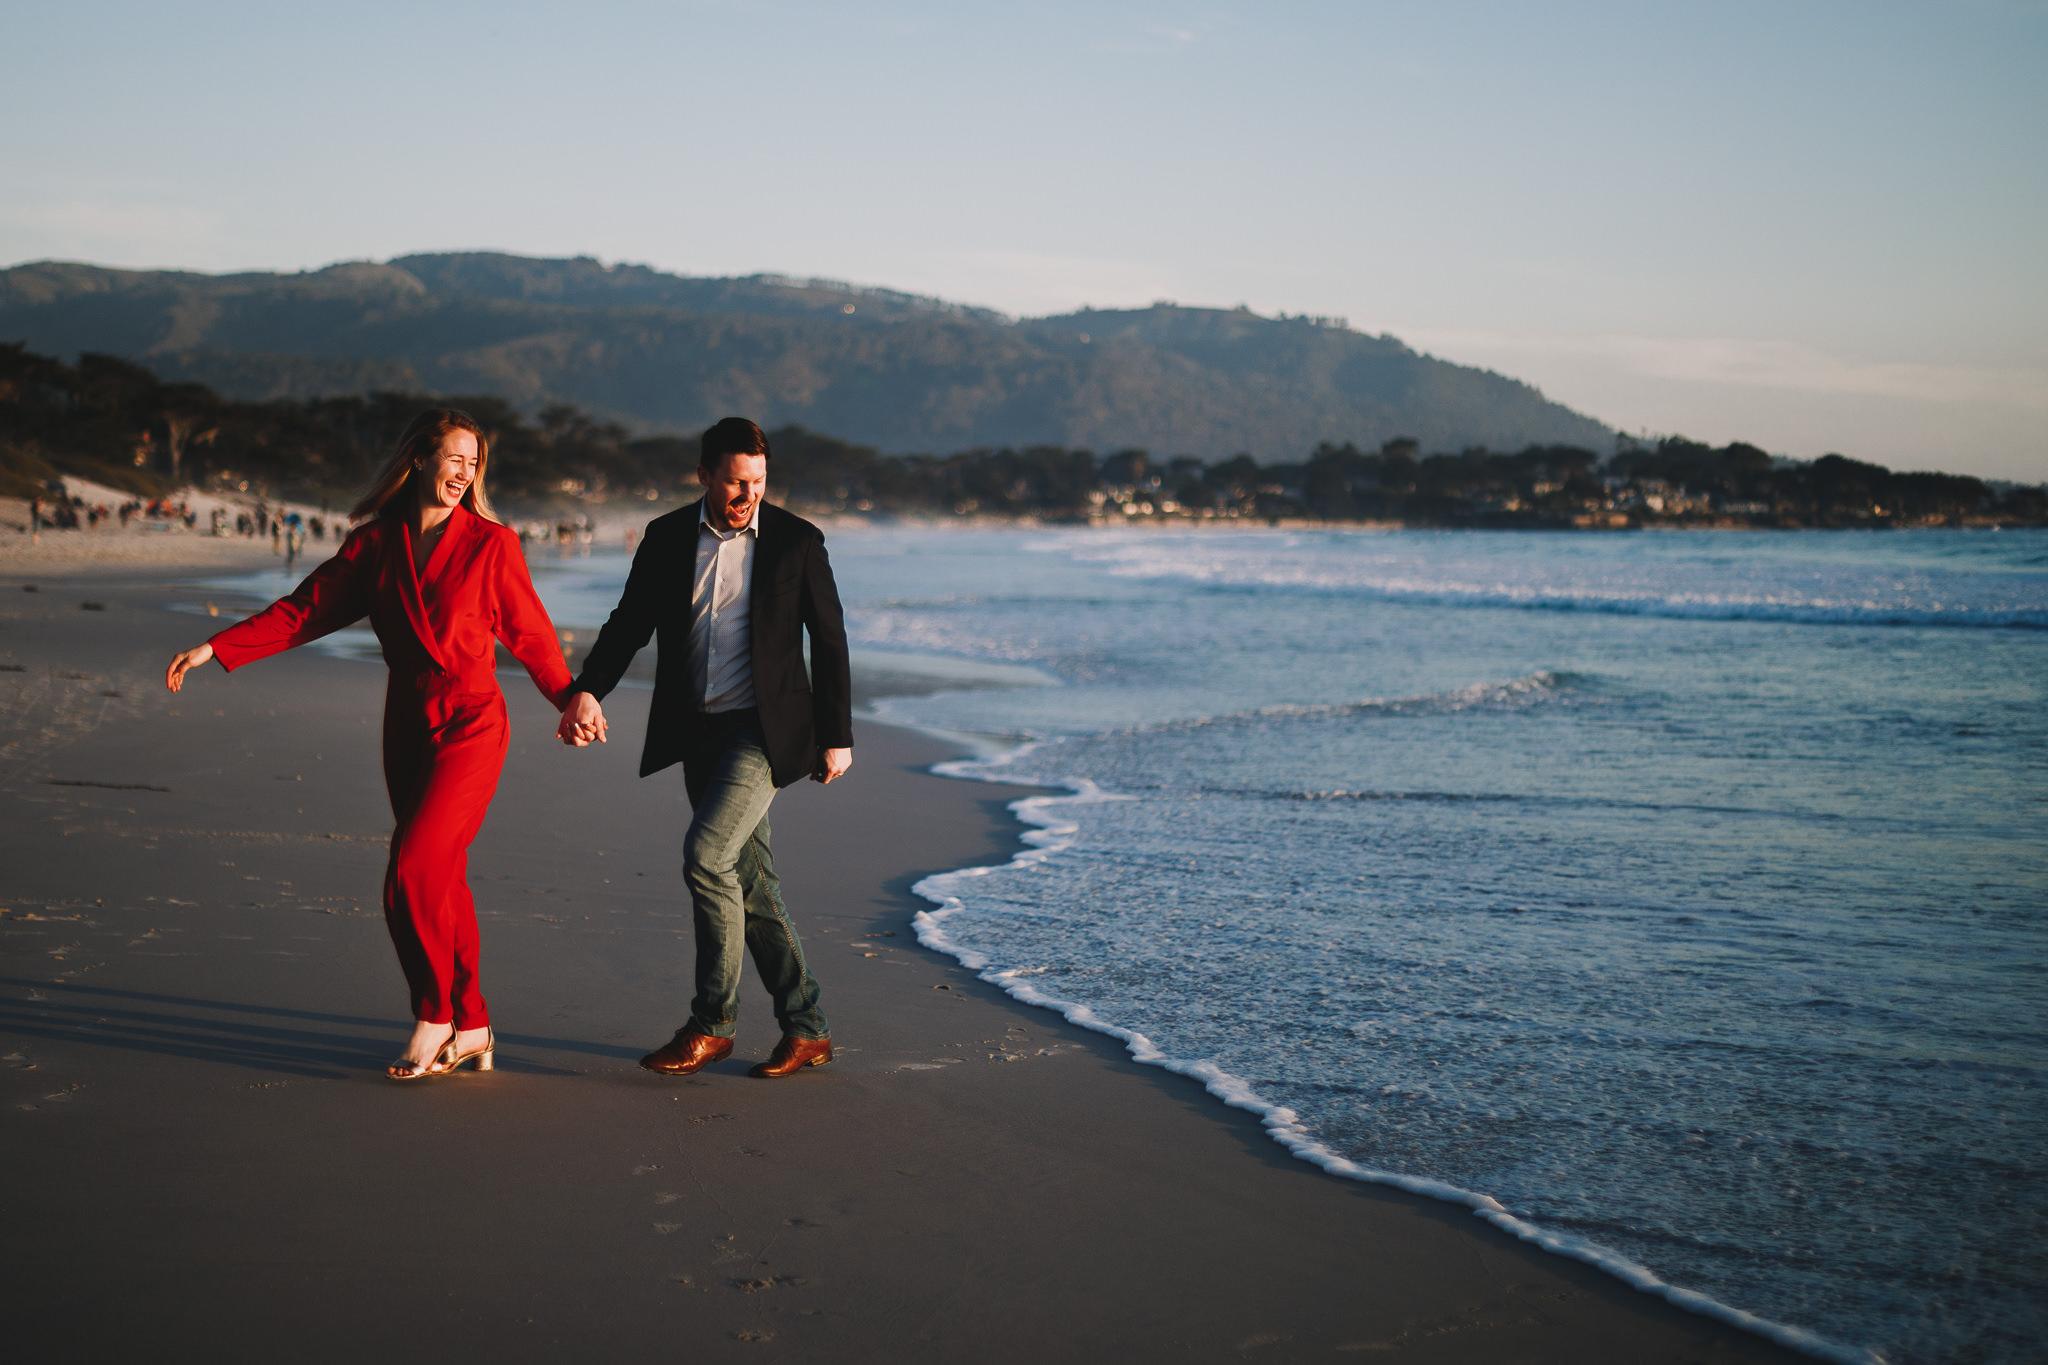 Archer Inspired Photography Carmel Beach California Wedding Engagement Lifestyle Anniversary Natural Light Photographer-35.jpg